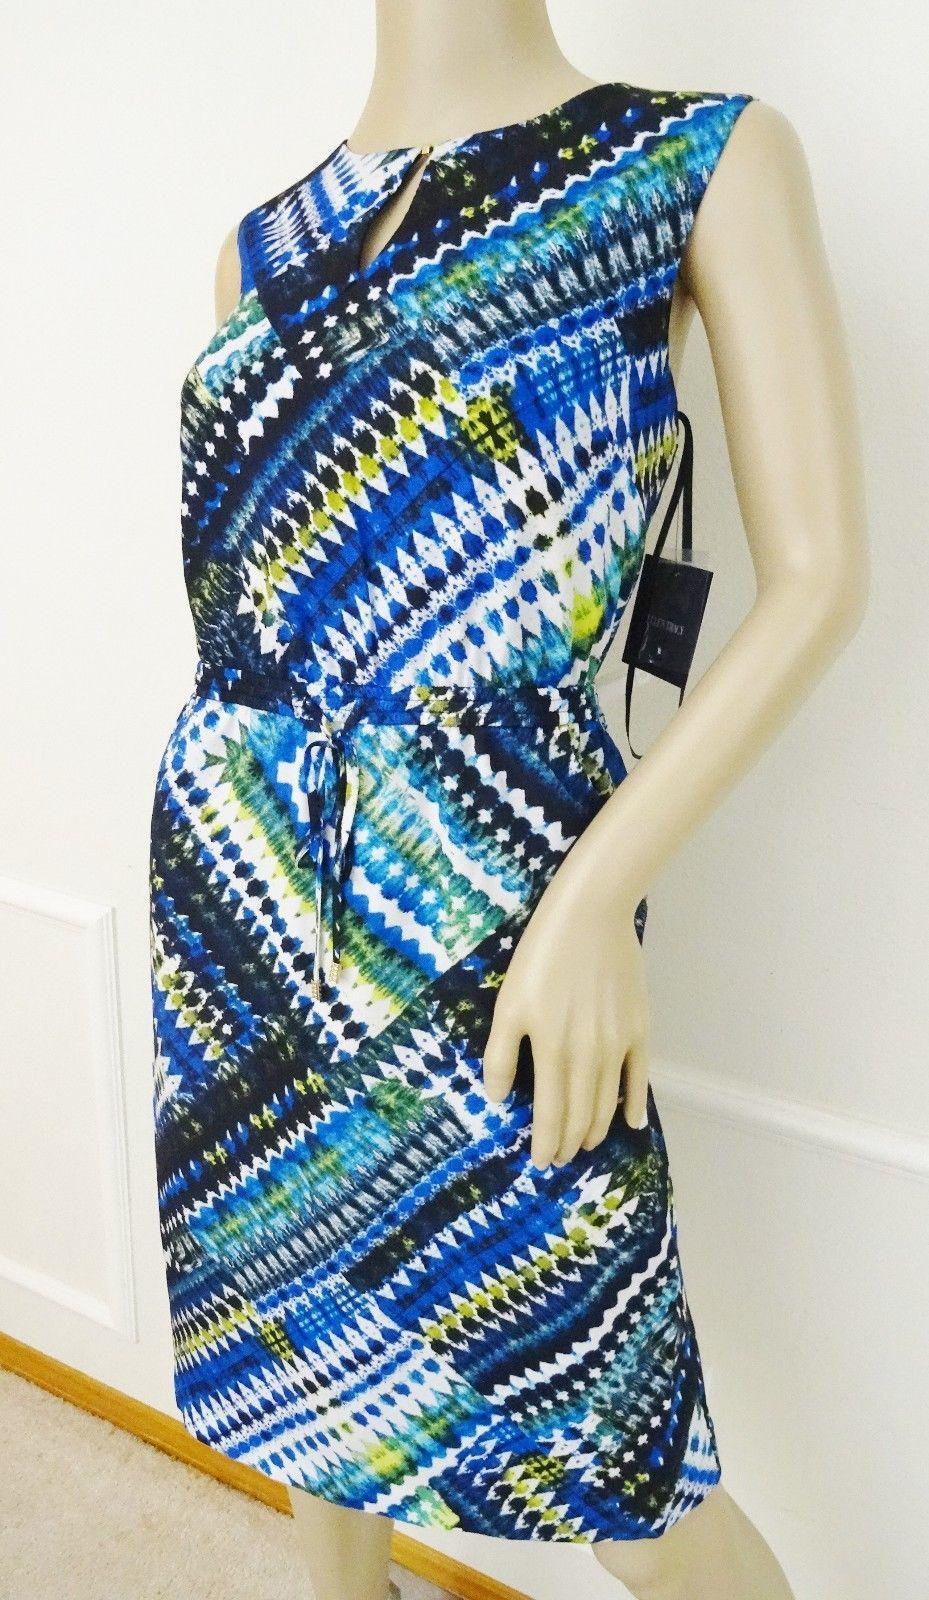 Nwt Ellen Tracy Sleeveless Belted Printed Sheath Dress Sz 10 Blue Geometric $99